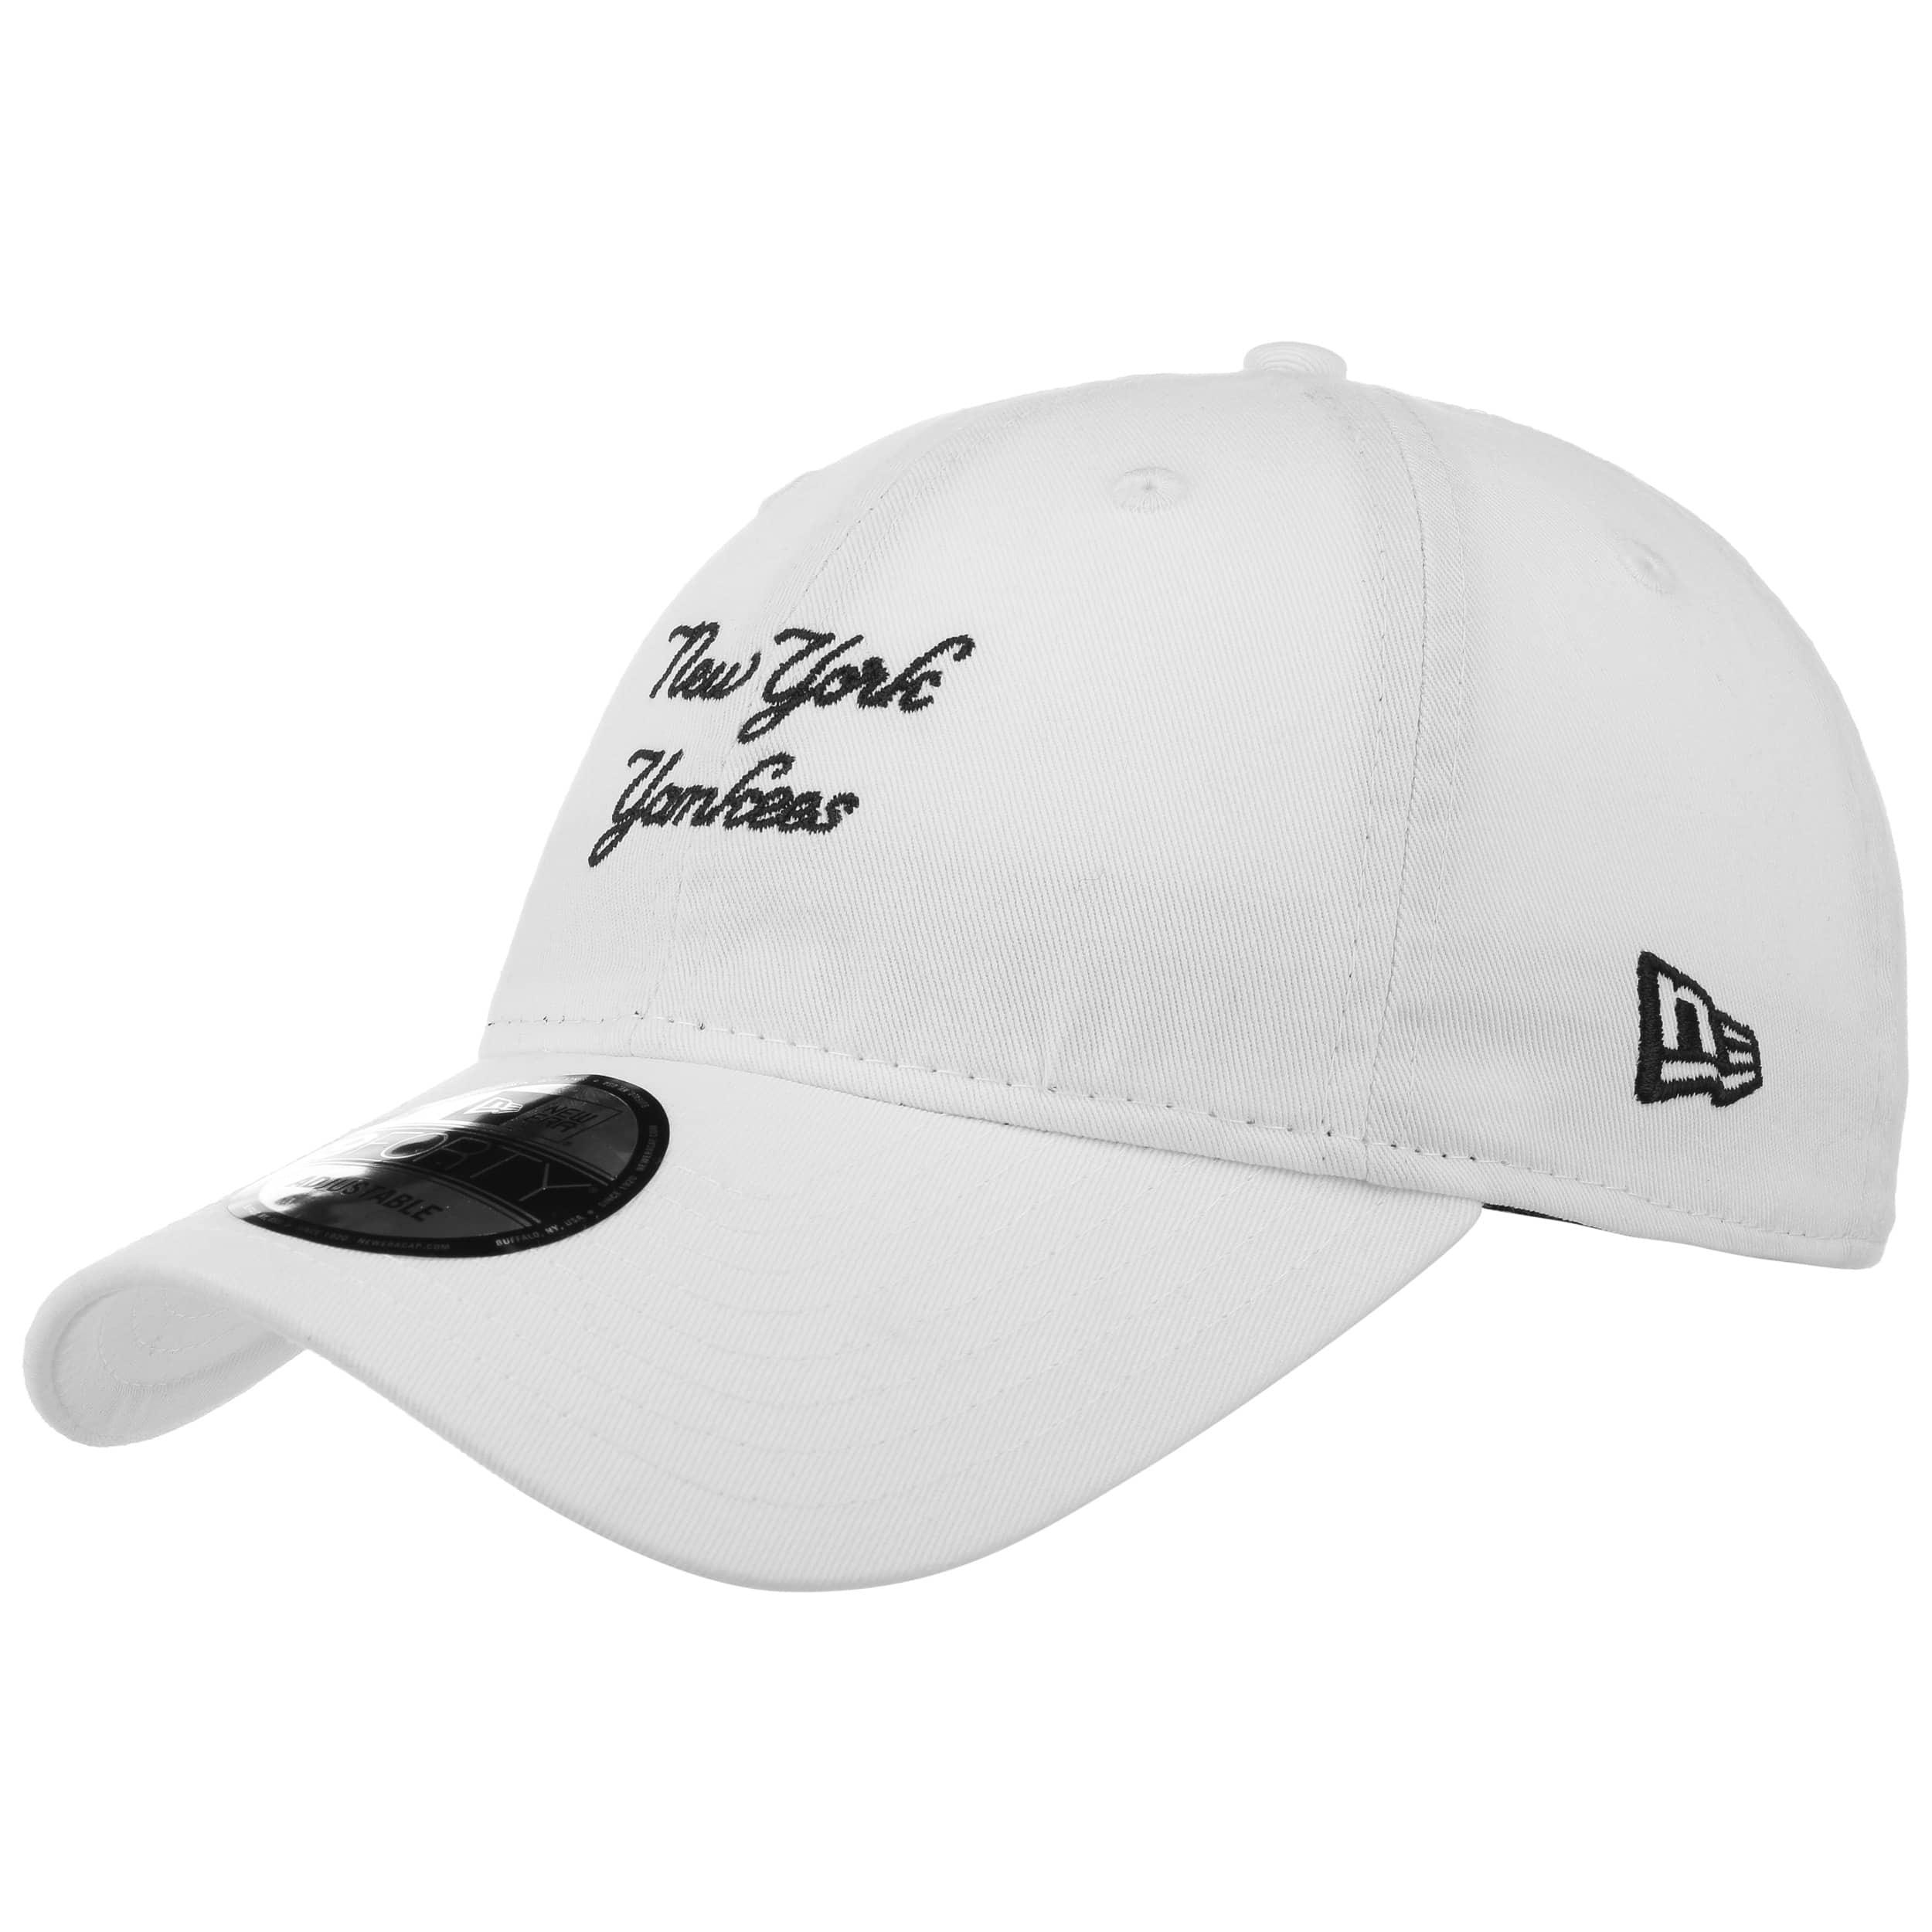 df470b46d42 ... 9Forty Sunbleach NY Yankees Cap by New Era - white 6 ...